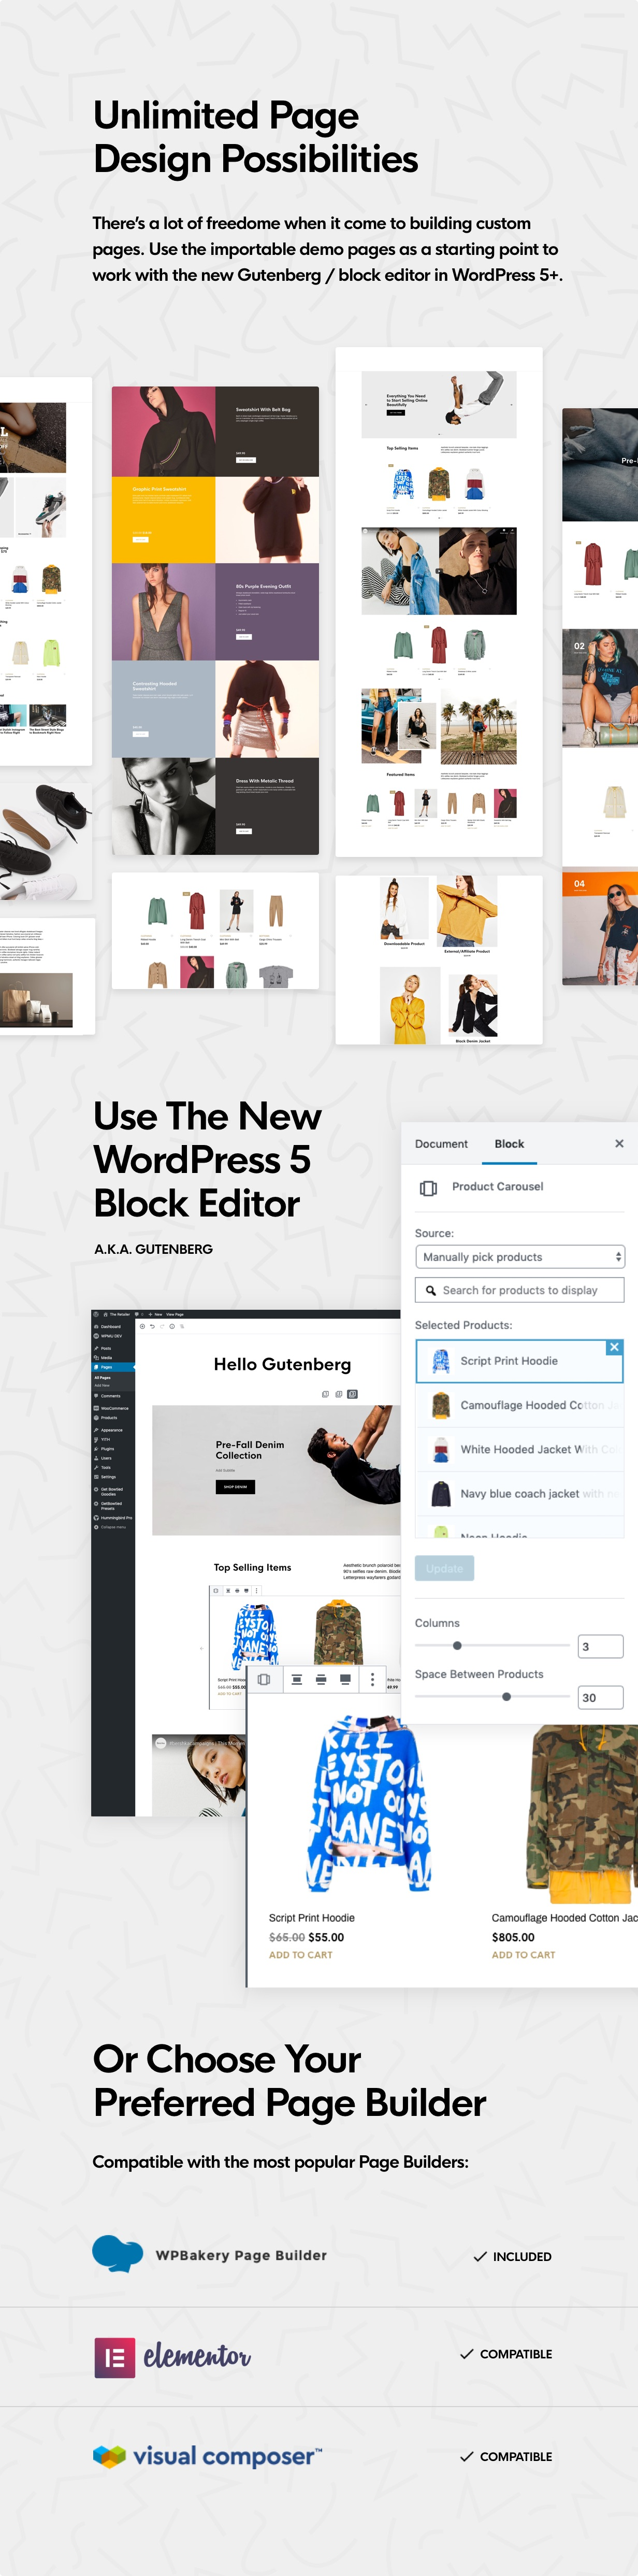 The Retailer - eCommerce WordPress Theme for WooCommerce - 12